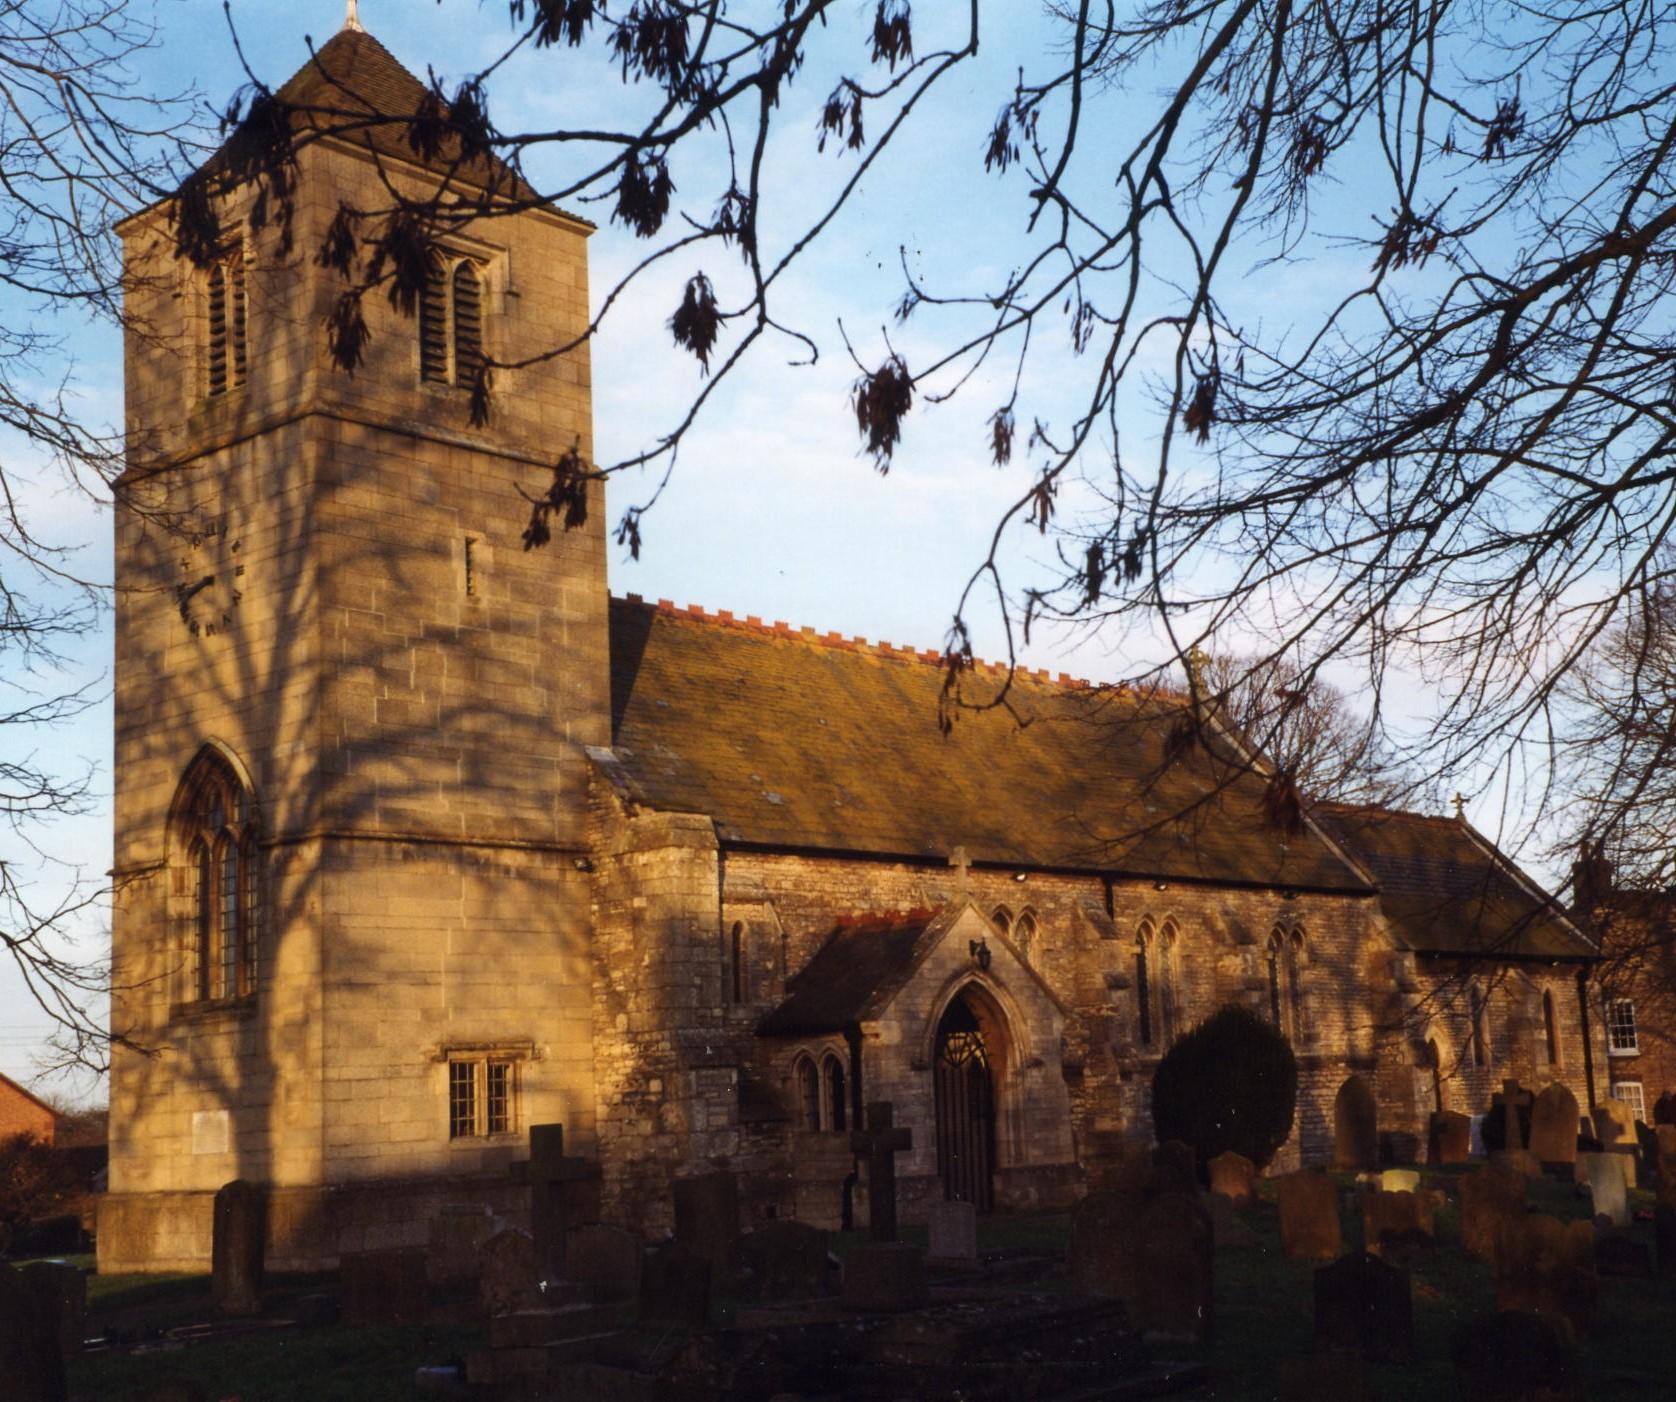 St. Hibbald's Church